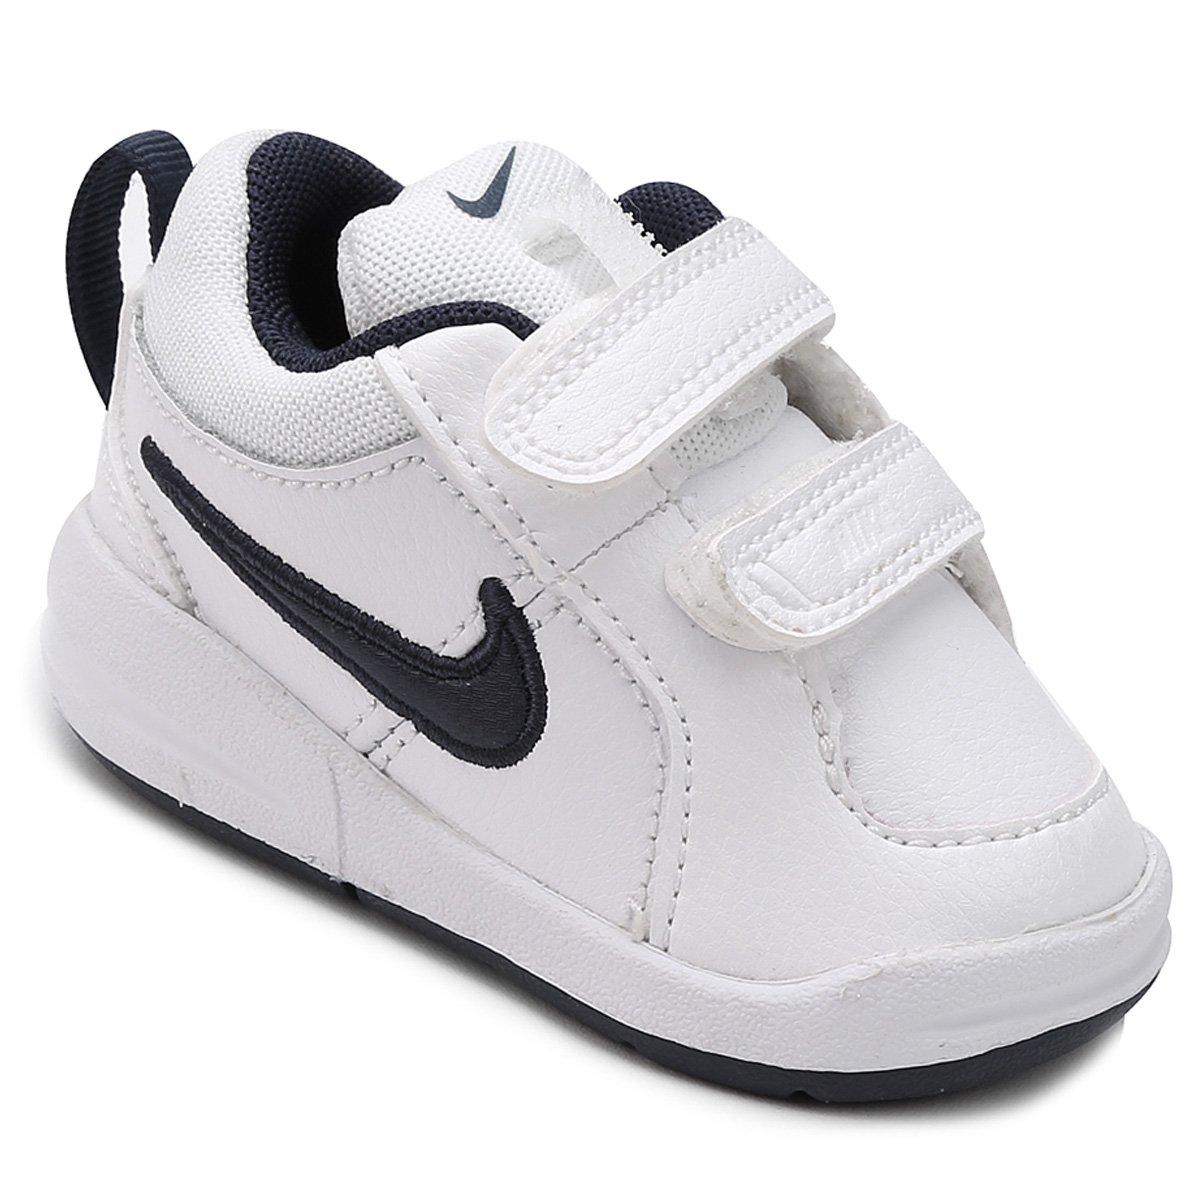 14d8978c54b Tênis Nike Pico 4 infantil - Compre Agora